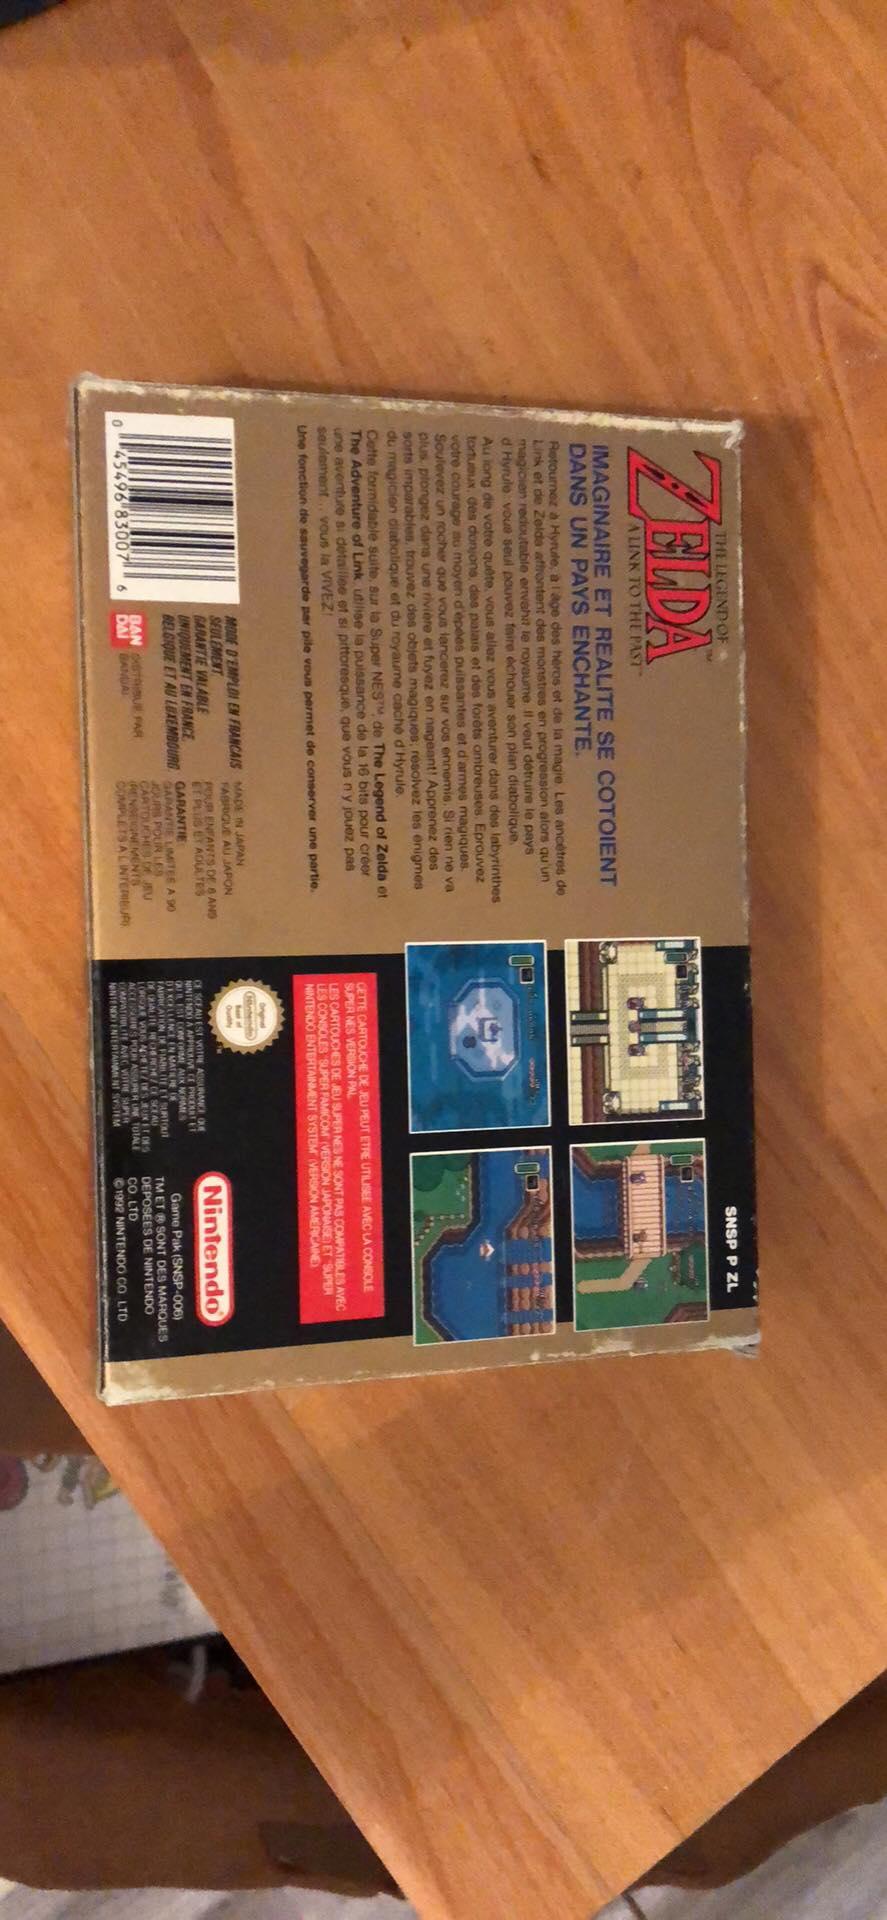 [ECH-VTE] Boutique multi d'elwing (Nes/Snes/Zelda/castlevania/Pokemon/FF) - Page 6 Zelda_10